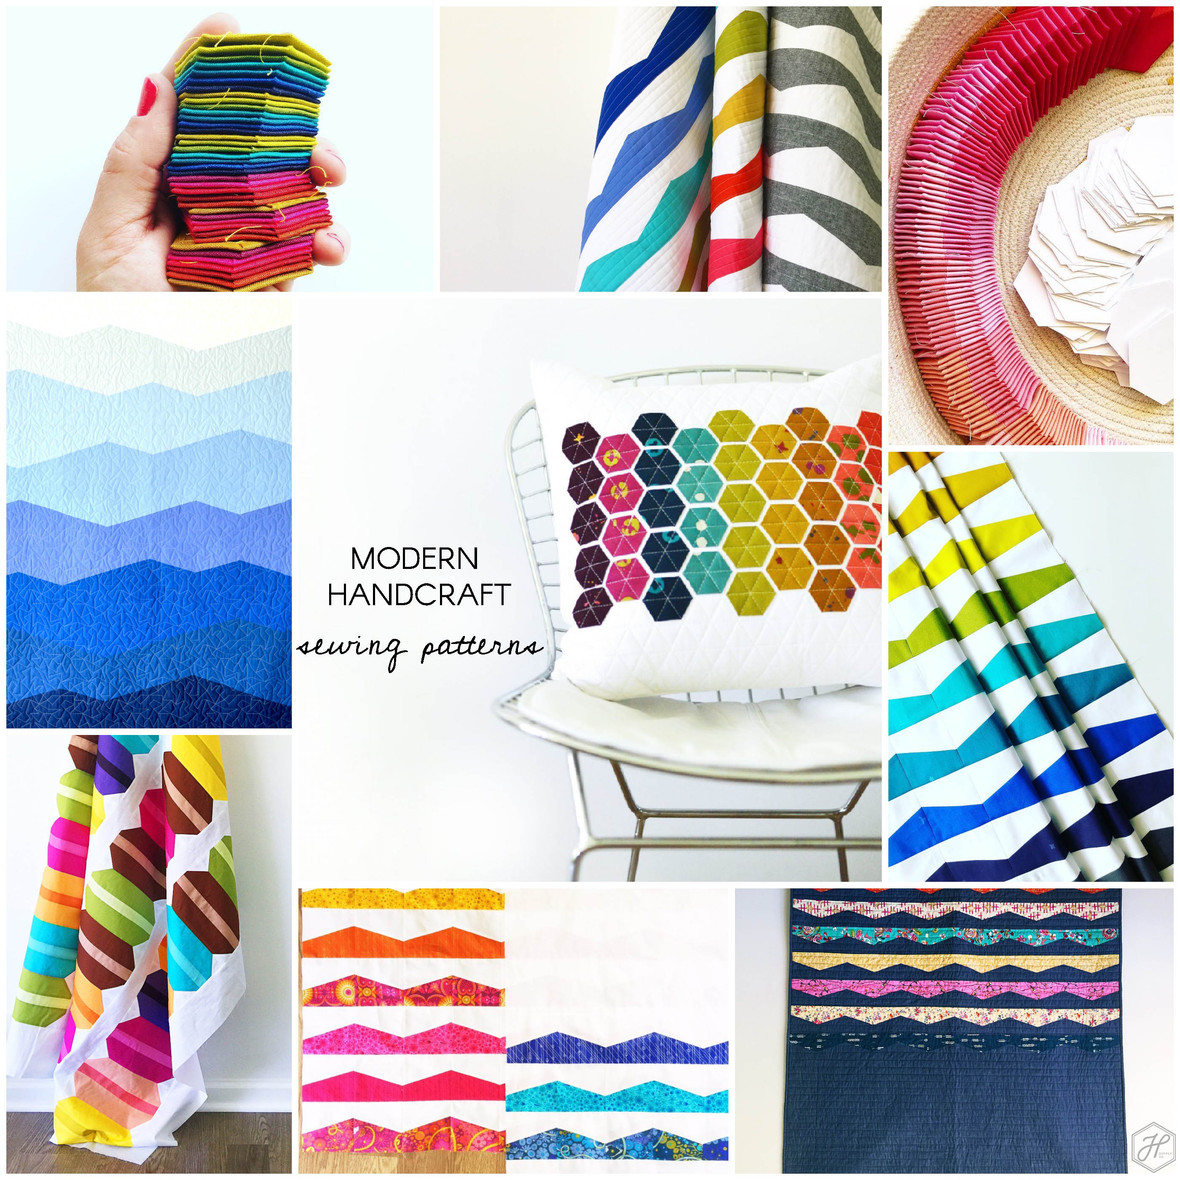 Modern Handcraft Sewing Patterns